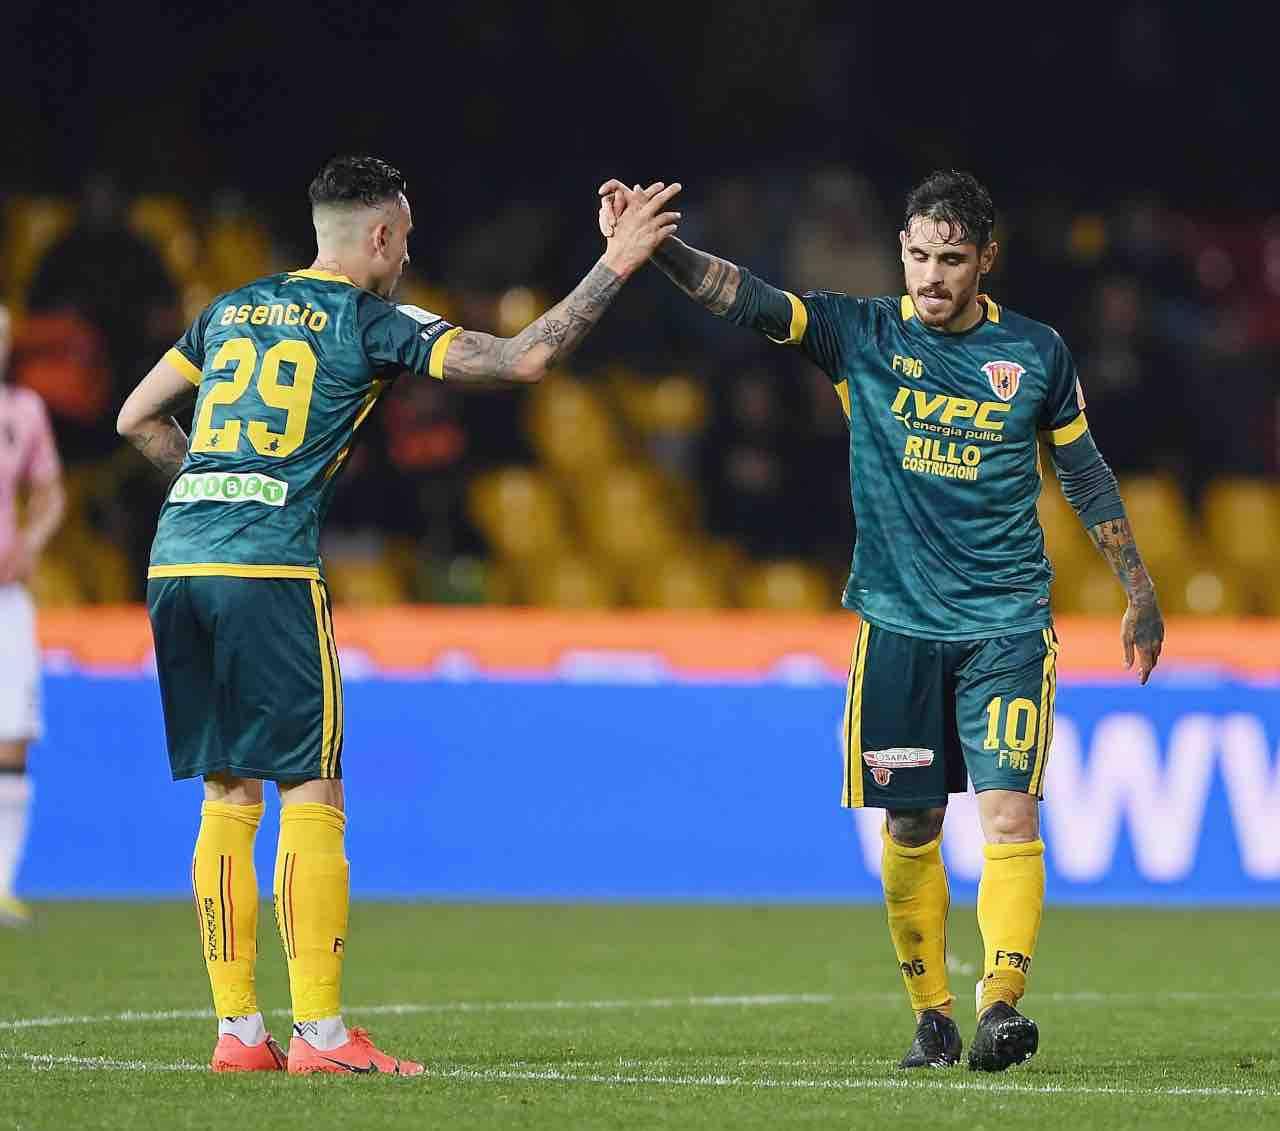 Calciomercato Salernitana Dany Mota Carvalho Litteri Asencio Serie B